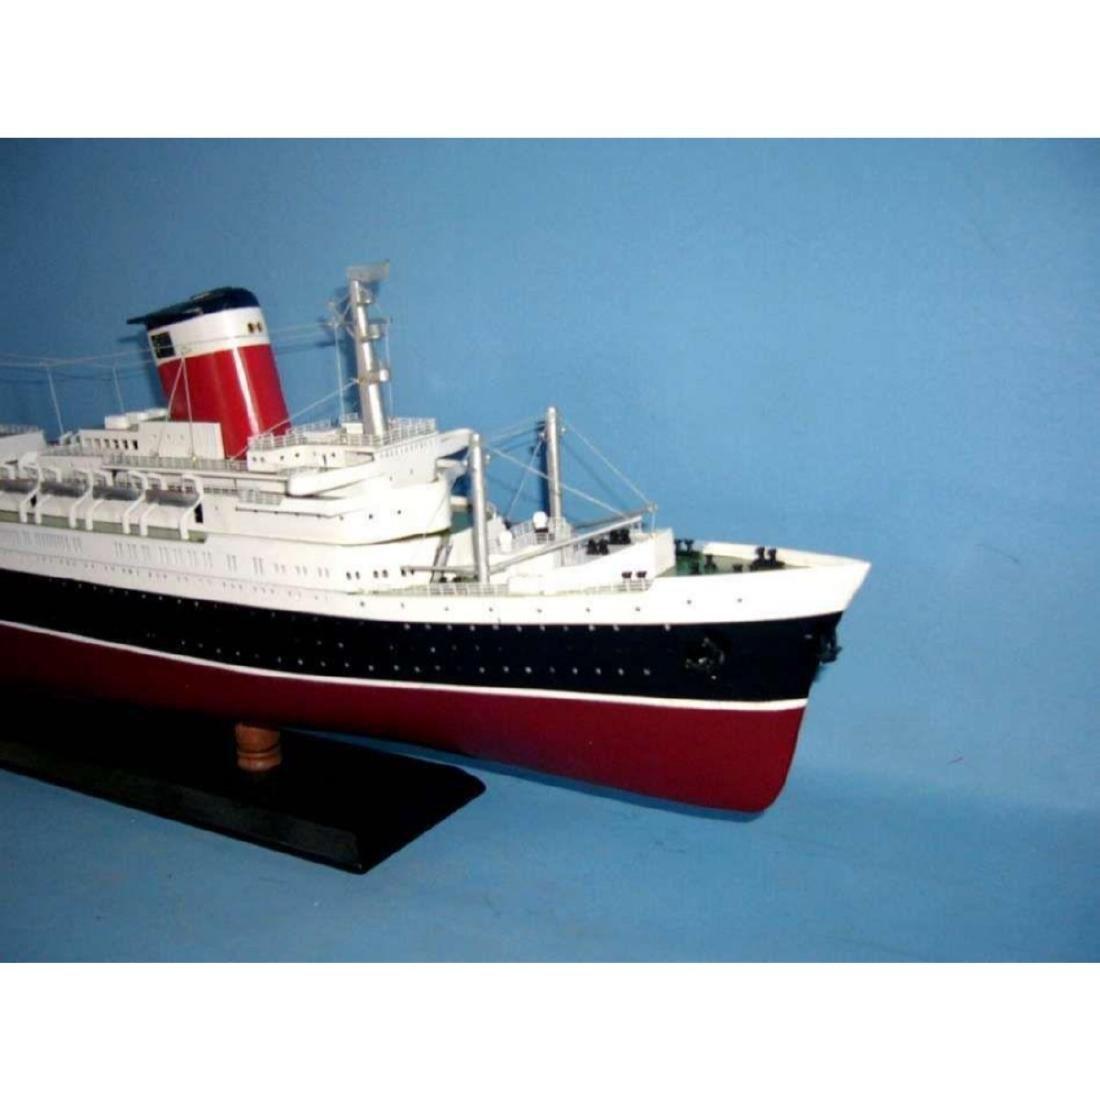 "SS United States Limited Model Cruise Ship 40"" w/ LED - 5"